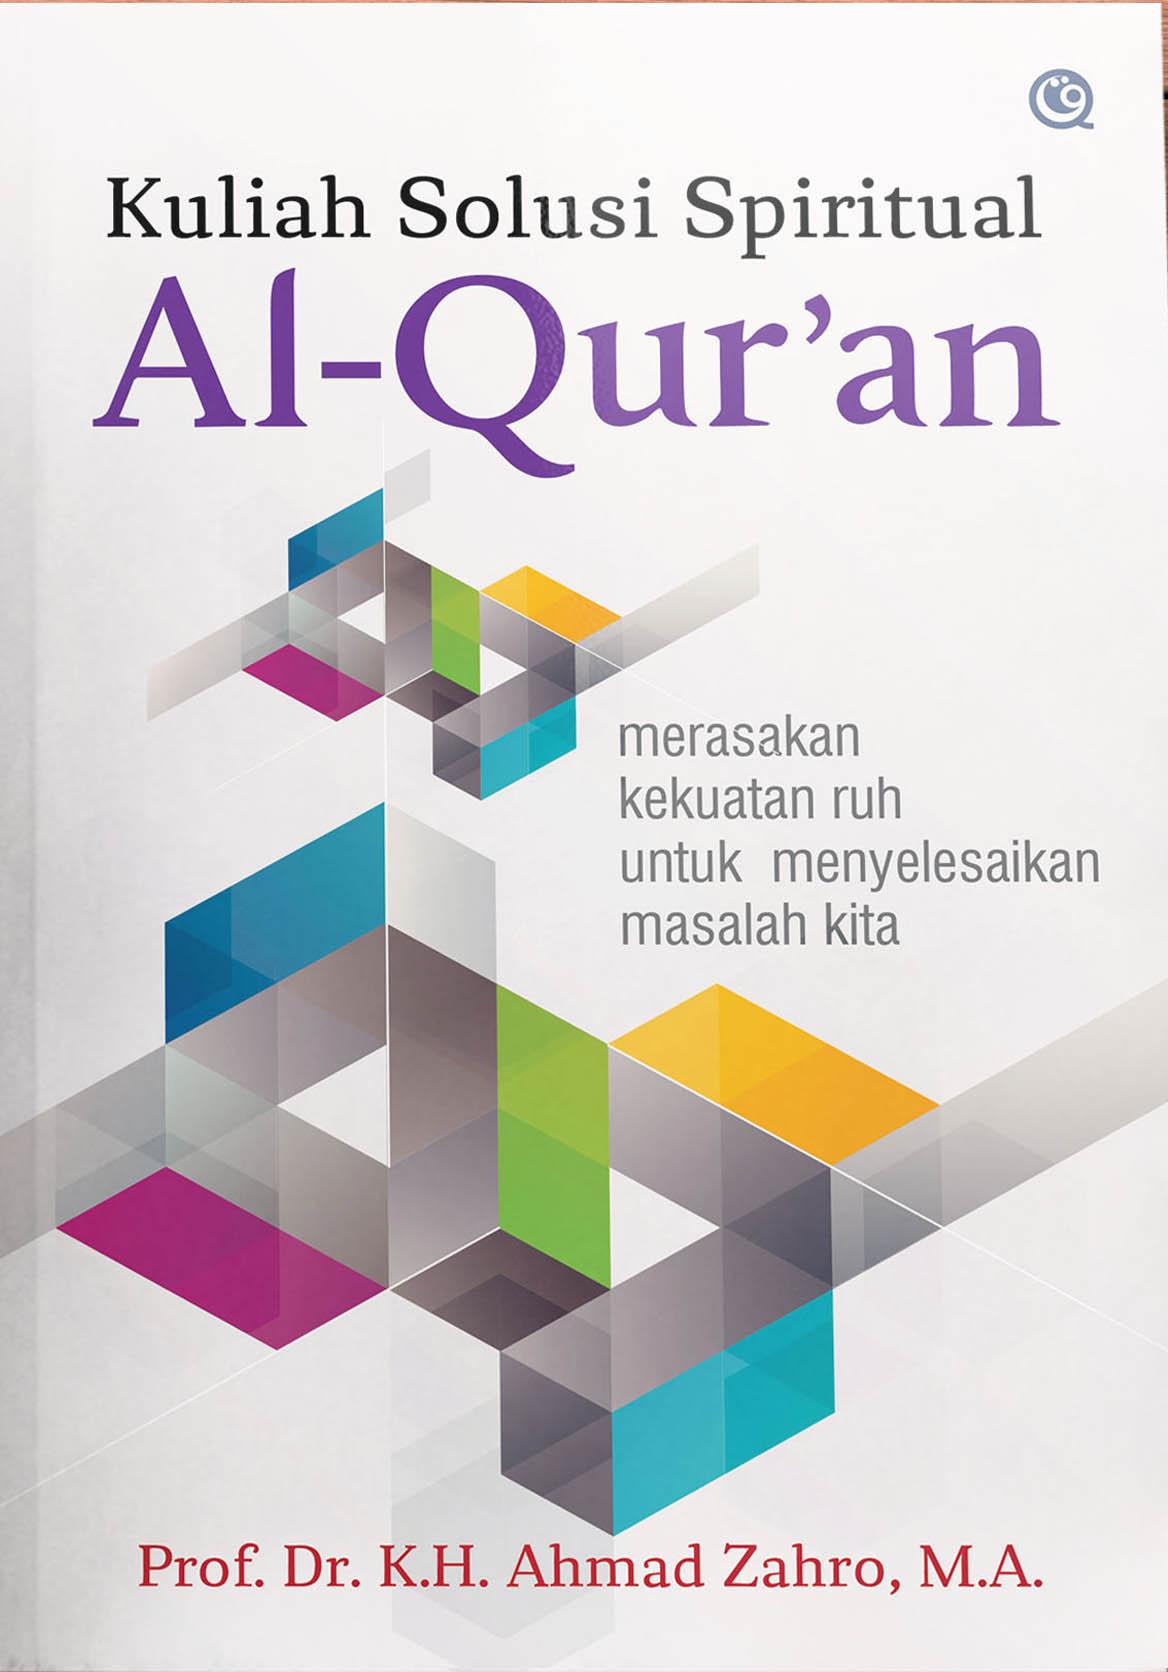 KULIAH SOLUSI SPIRITUAL AL-QURANen